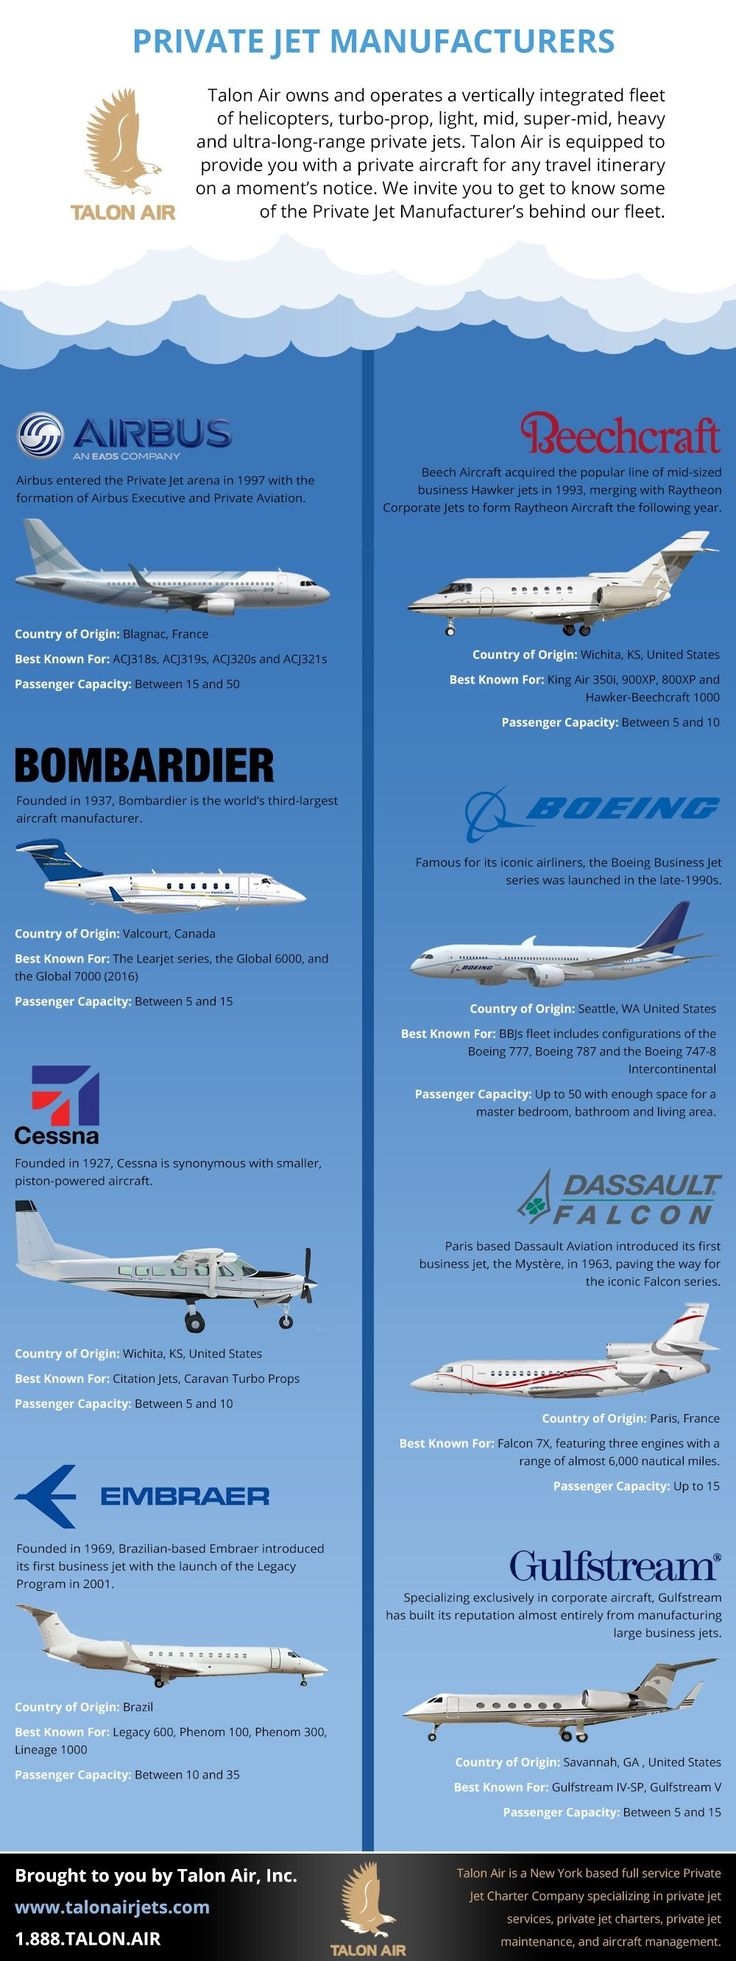 Private Jet Manufacturers. www.TalonAirJets.com. https://hotellook.com/countries/arab-emirates?marker=126022.viedereve